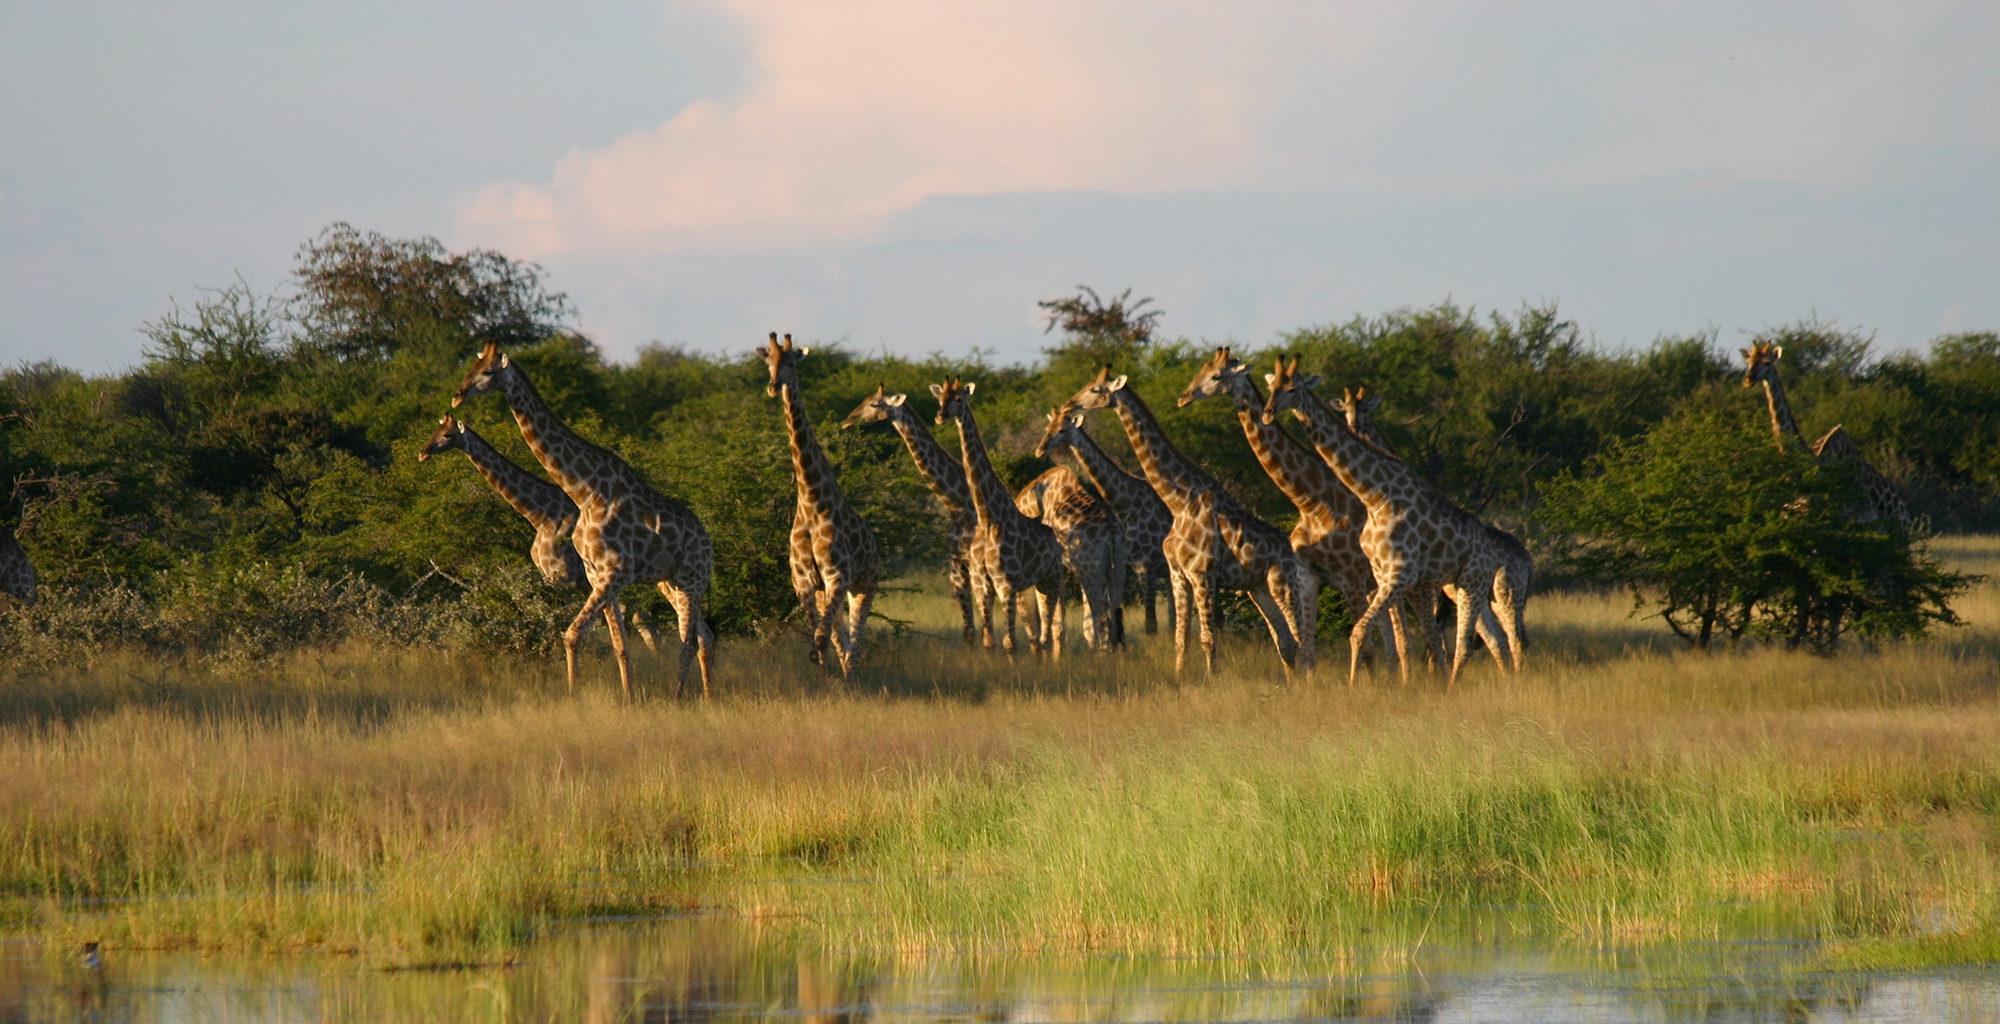 Namibia-Etosha-National-Park-Wildlife-Giraffe